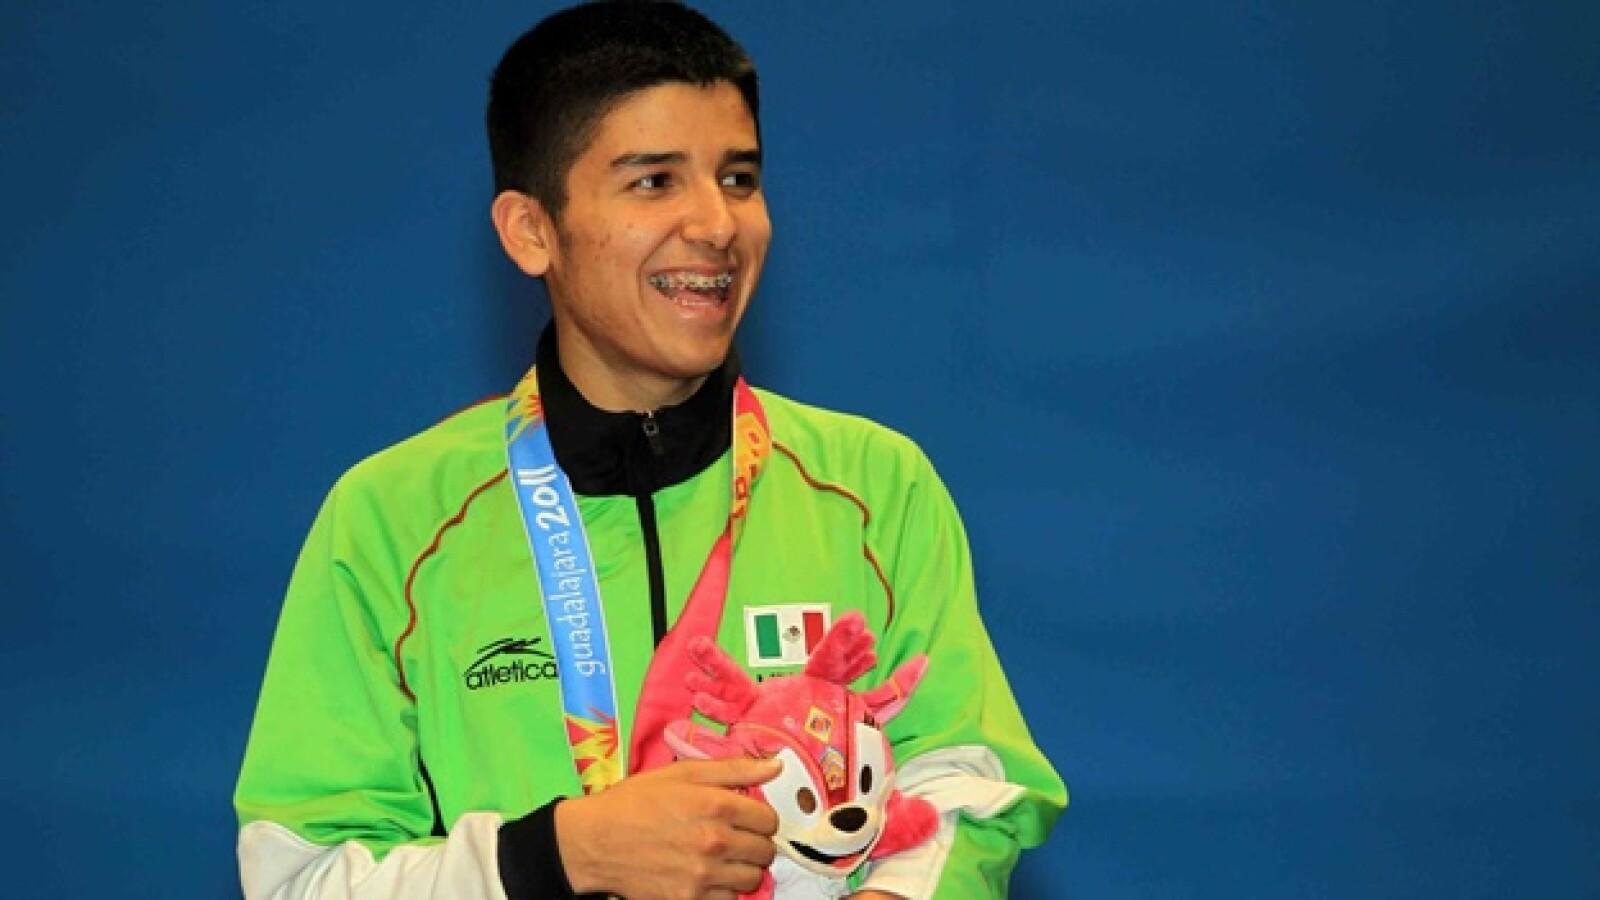 Rene Dominguez de Mexico medalla de plata,